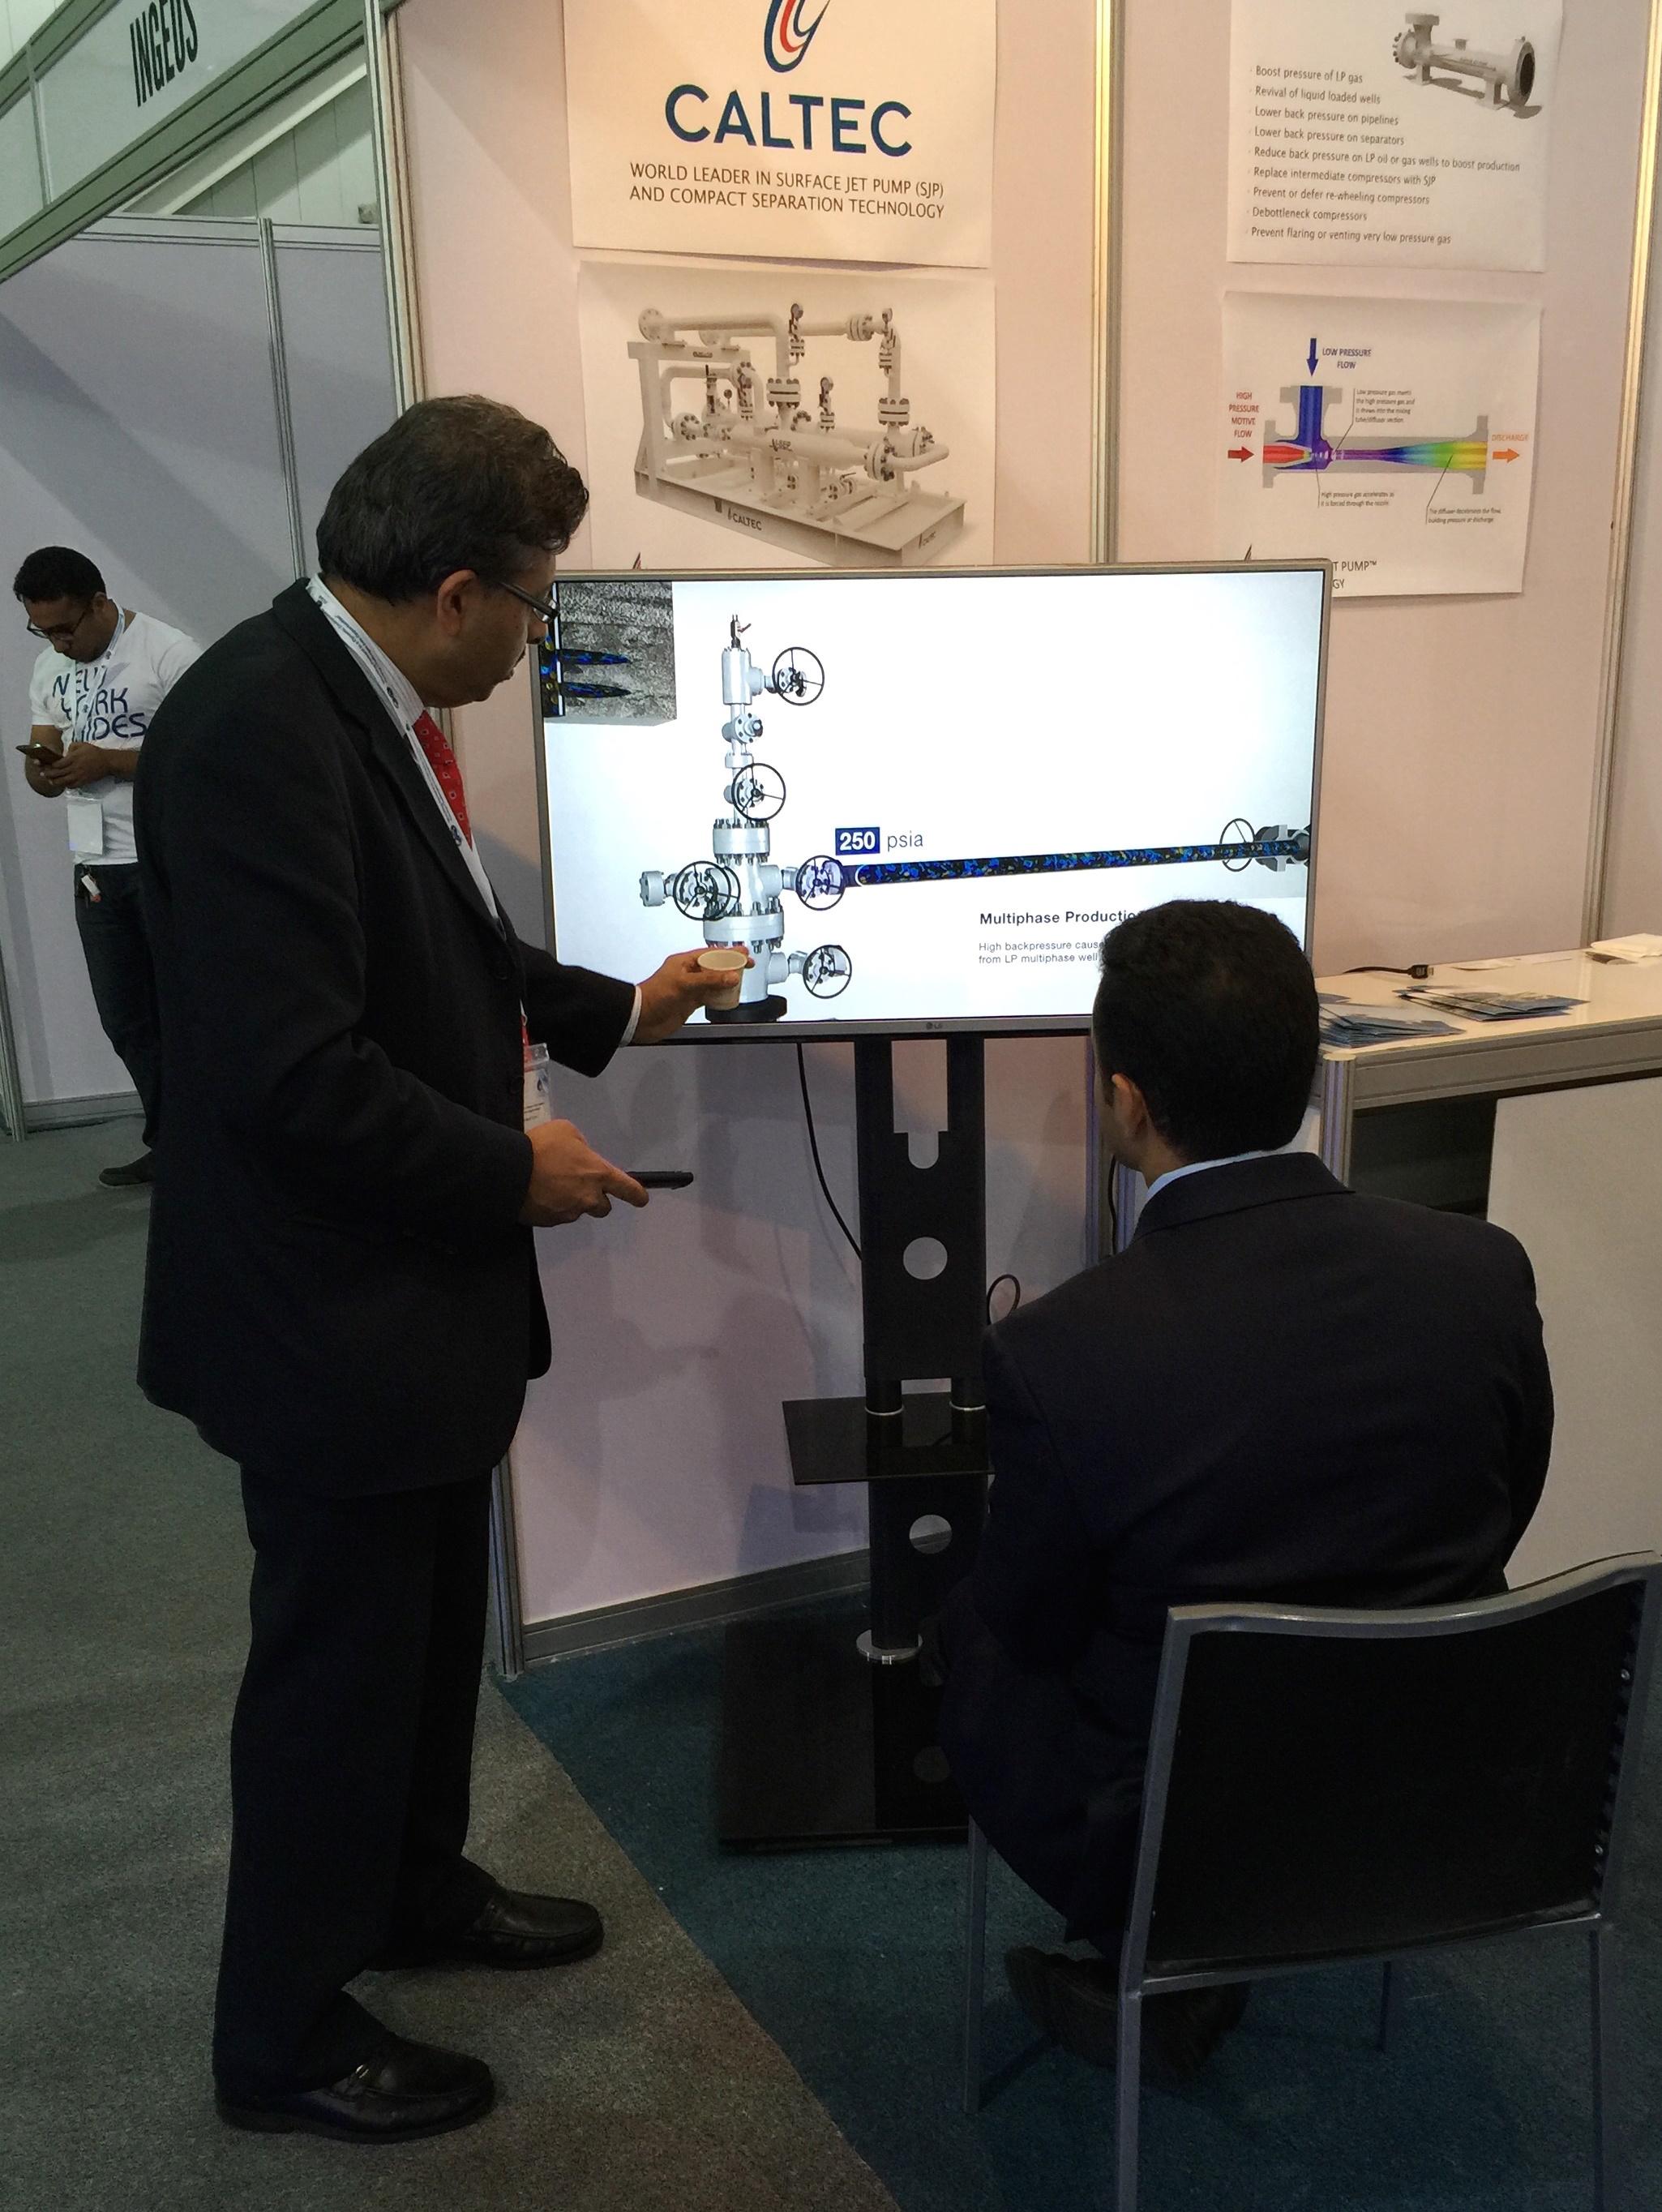 Caltec's Exhibiting and Presenting at SPE KSA Annual Technical Symposium & Exhibition